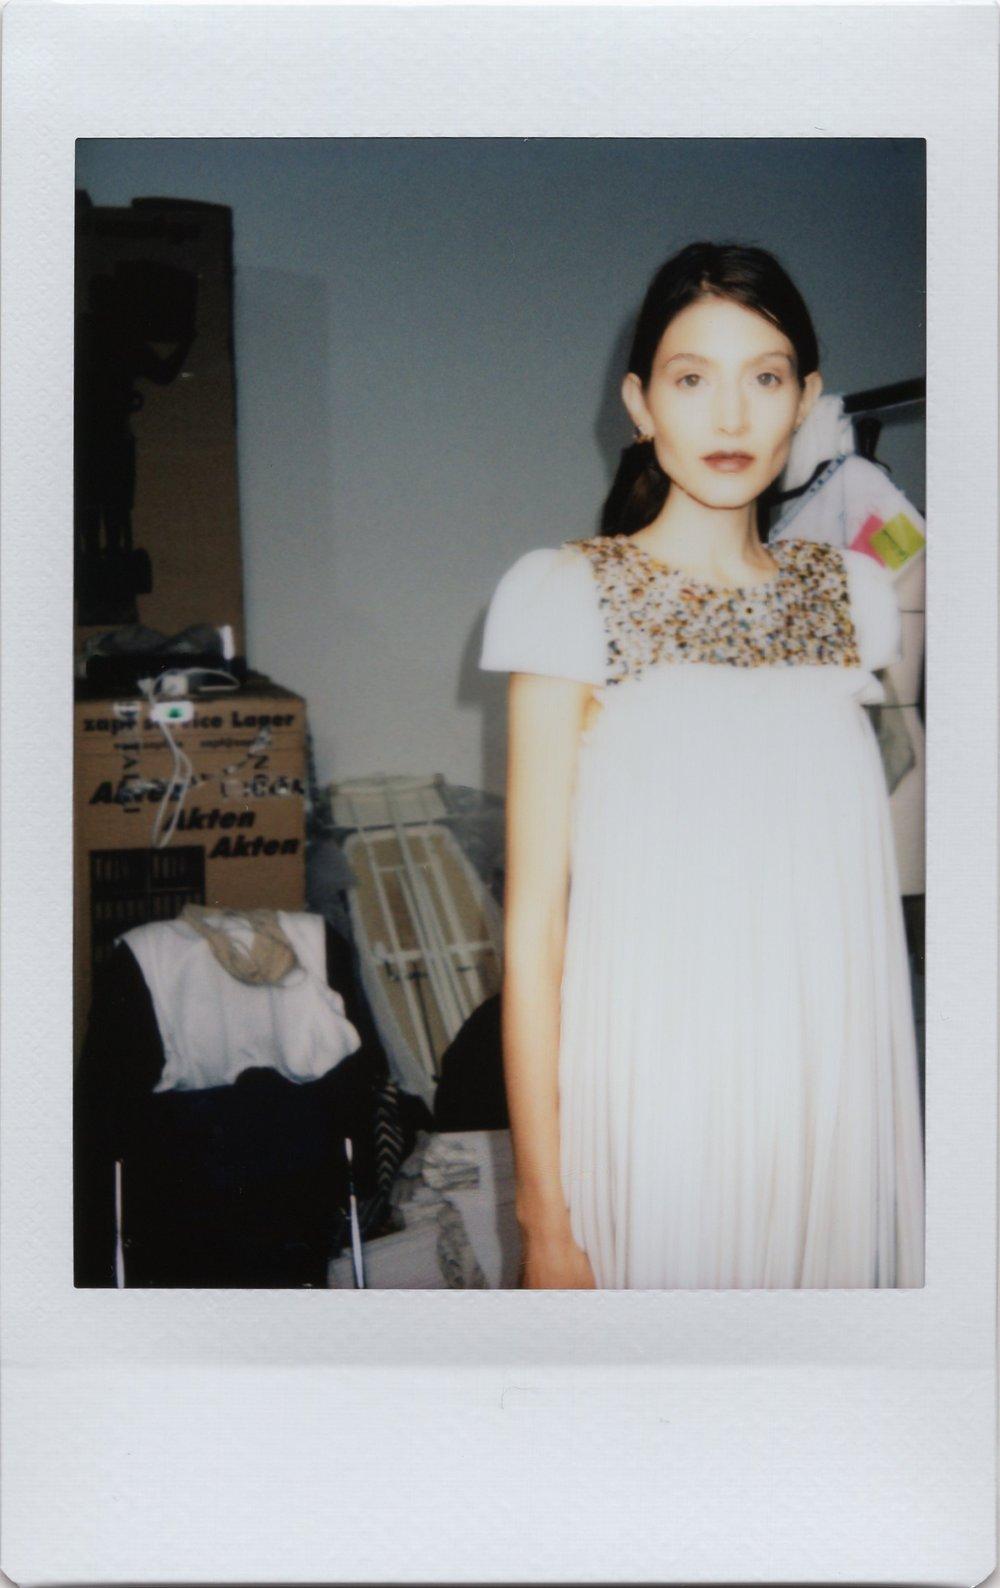 NobiTalai_Honigschreck_Polaroid_16.jpg